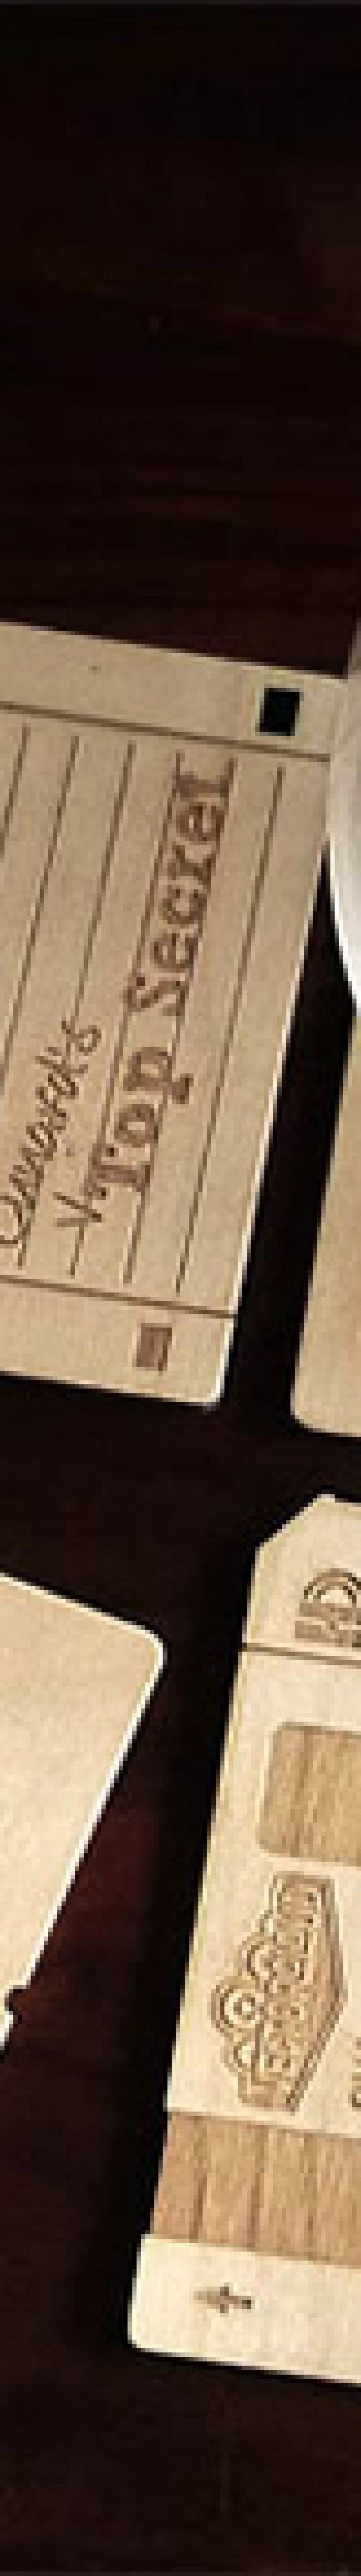 Porta-copos de madeira imitam disquetes   ROCK N TECH 0f5f2617a0